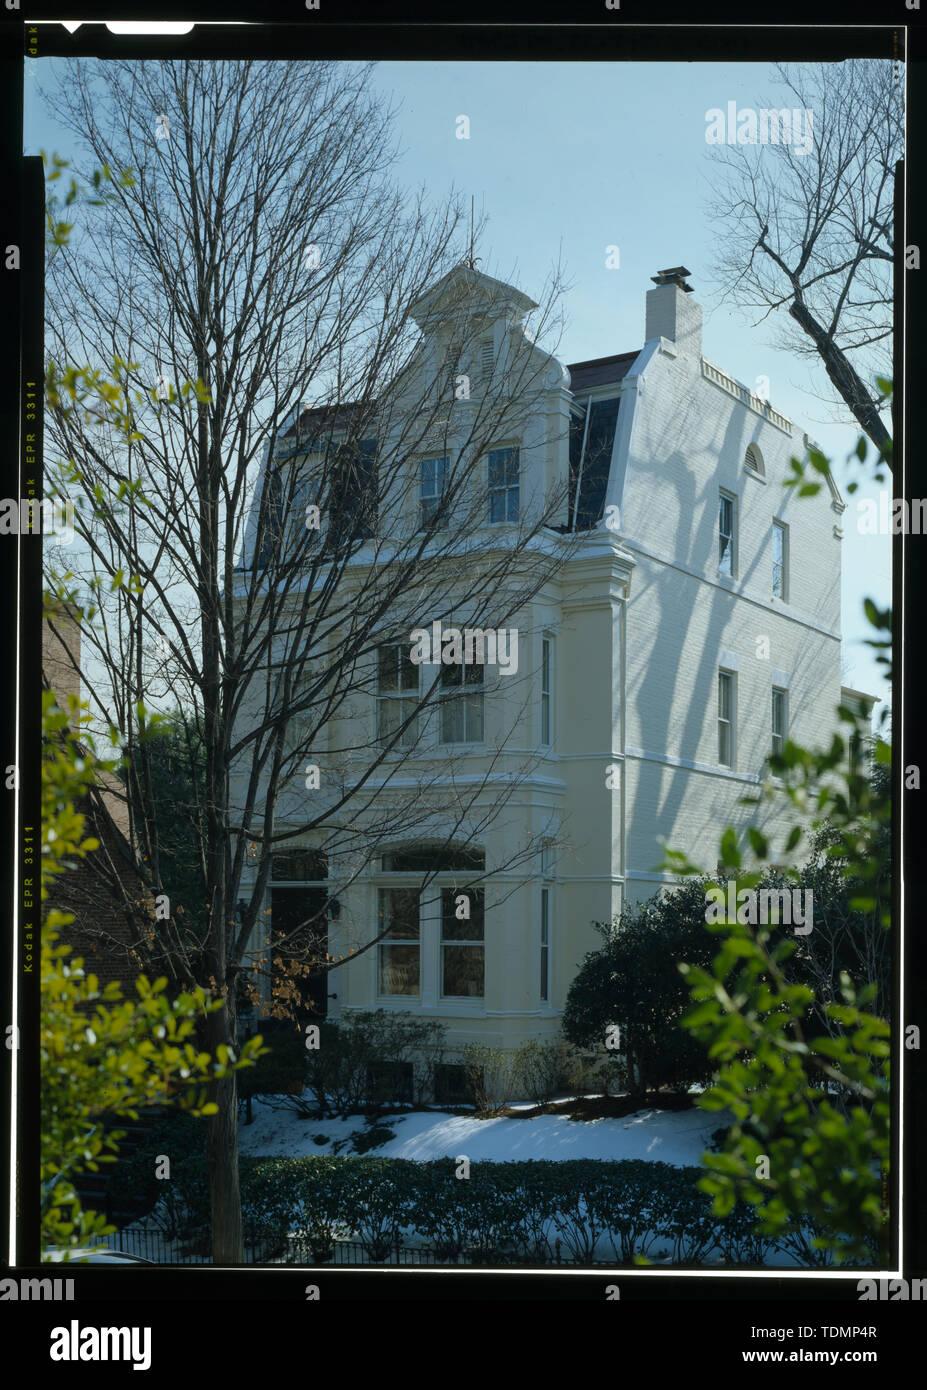 Perspective view (duplicate of HABS No. DC-848-1) - Gustav Freibus House, 3038 Dumbarton Street, Northwest, Washington, District of Columbia, DC - Stock Image